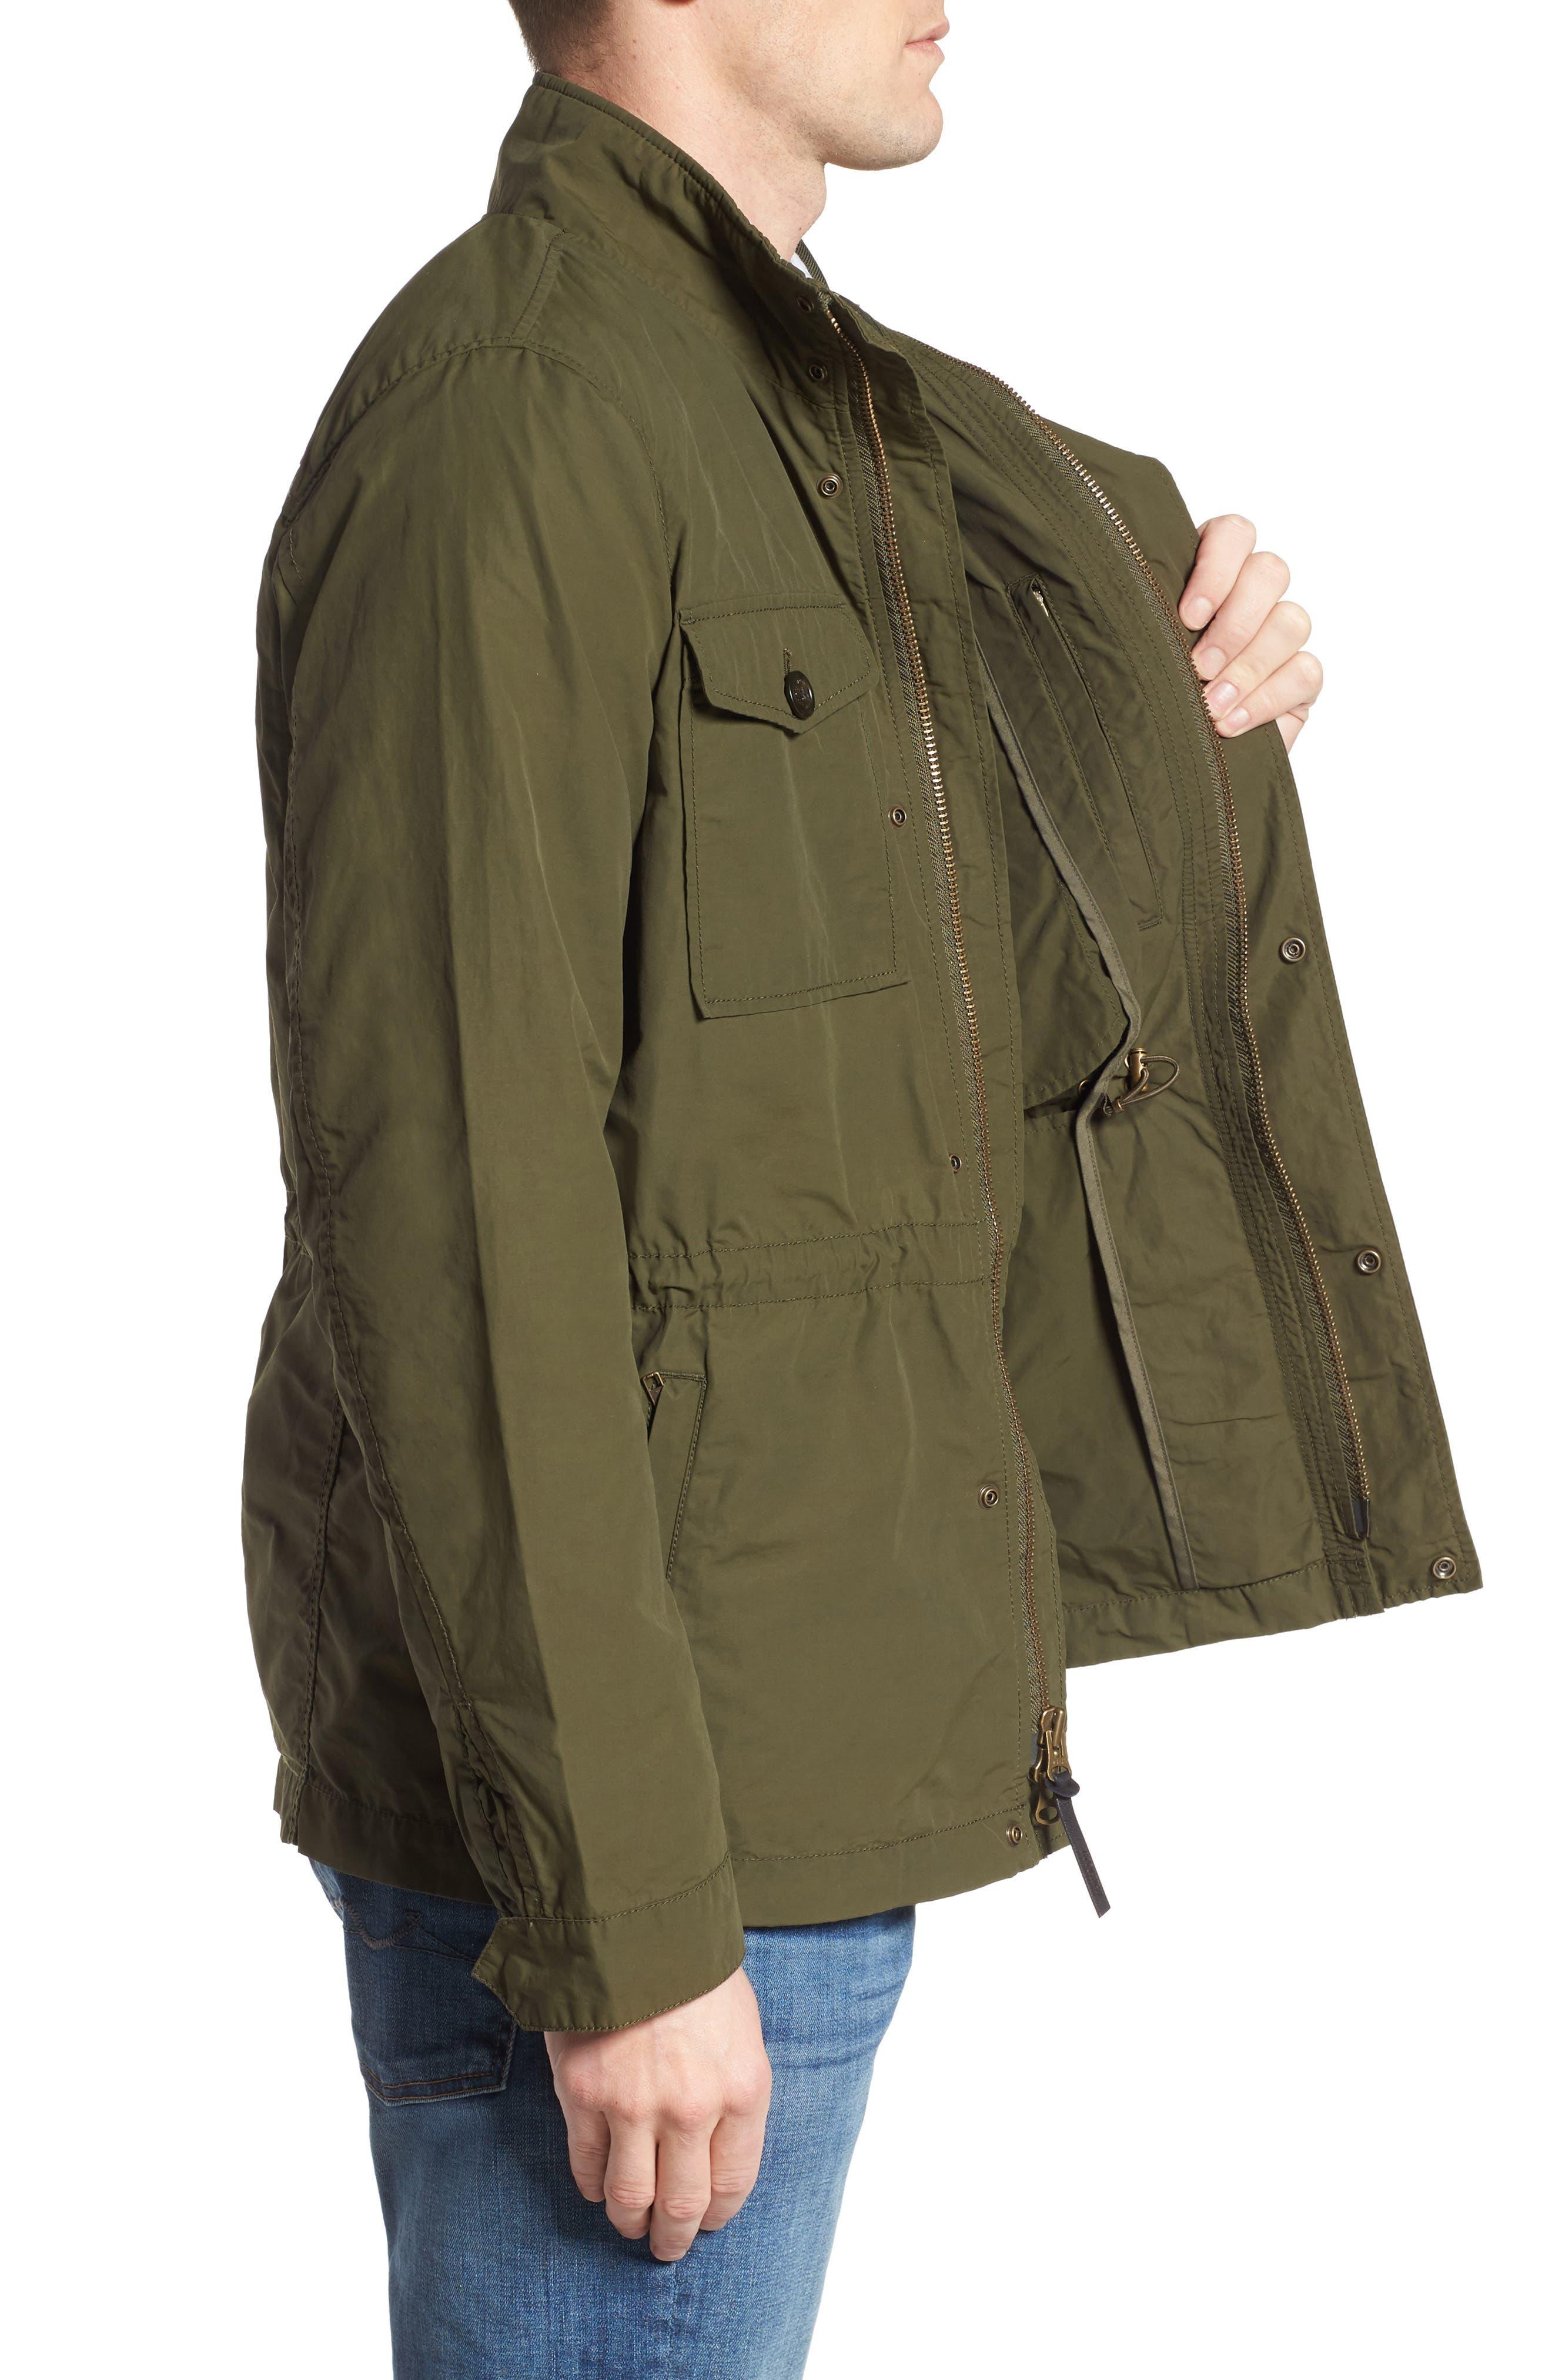 Military Field Jacket,                             Alternate thumbnail 3, color,                             313